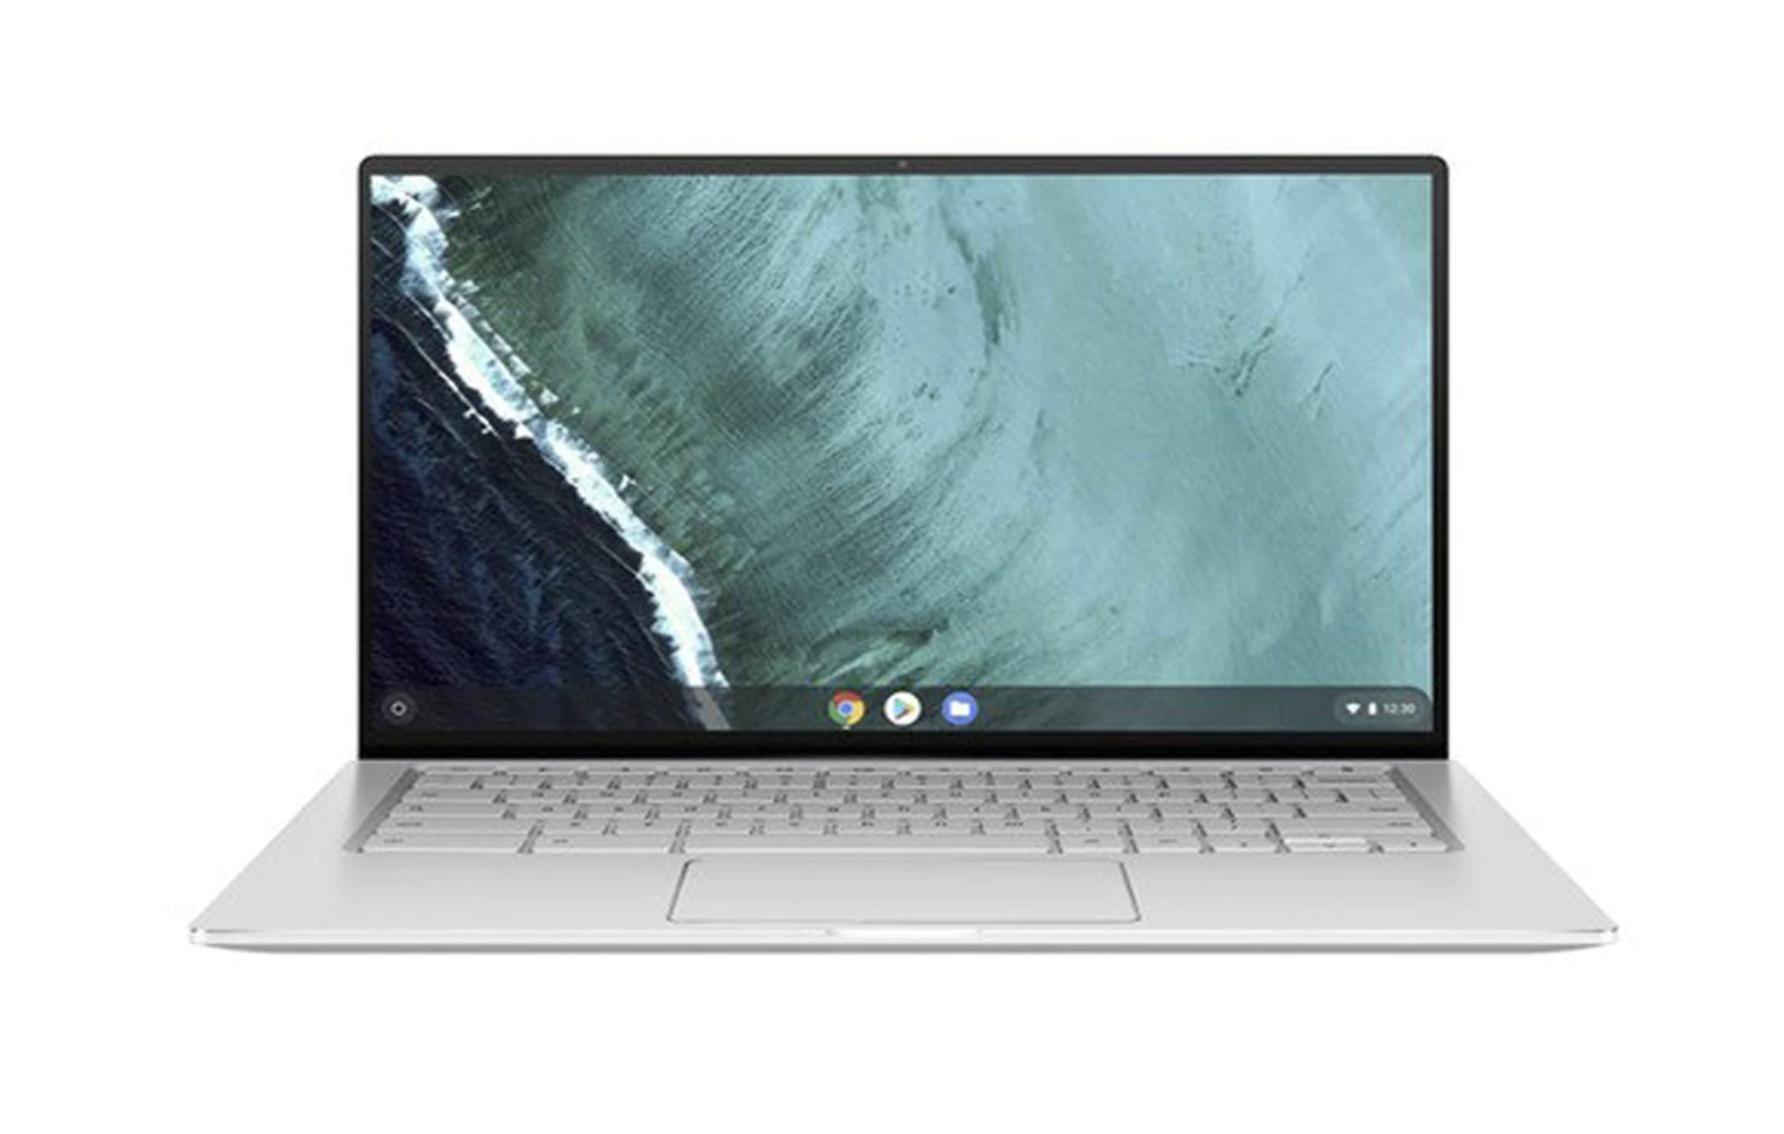 Chromebook portátil ASUS Z3400CT-H50130 (C425), Intel M3, 8GB, 128GB eMMC